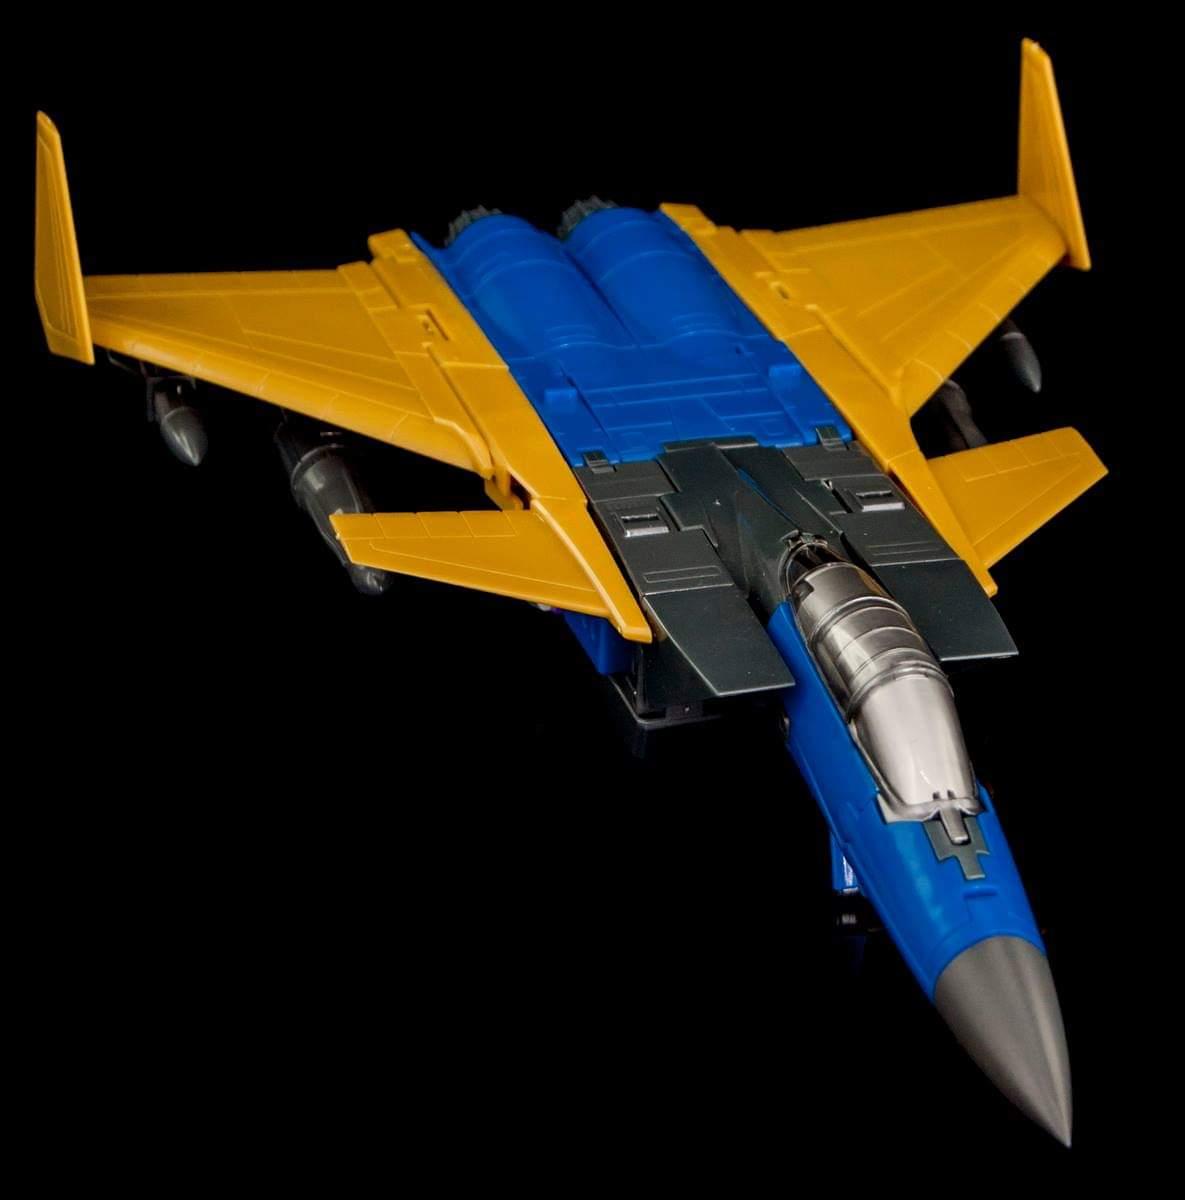 [Maketoys] Produit Tiers - Jouets MTRM-15 Endgame (aka Dirge/Funébro), MTRM-16 Jetstream (aka Thrust/Fatalo) & MTRM-17 Booster (aka Ramjet/Statoréacto) 1PHZj8xi_o